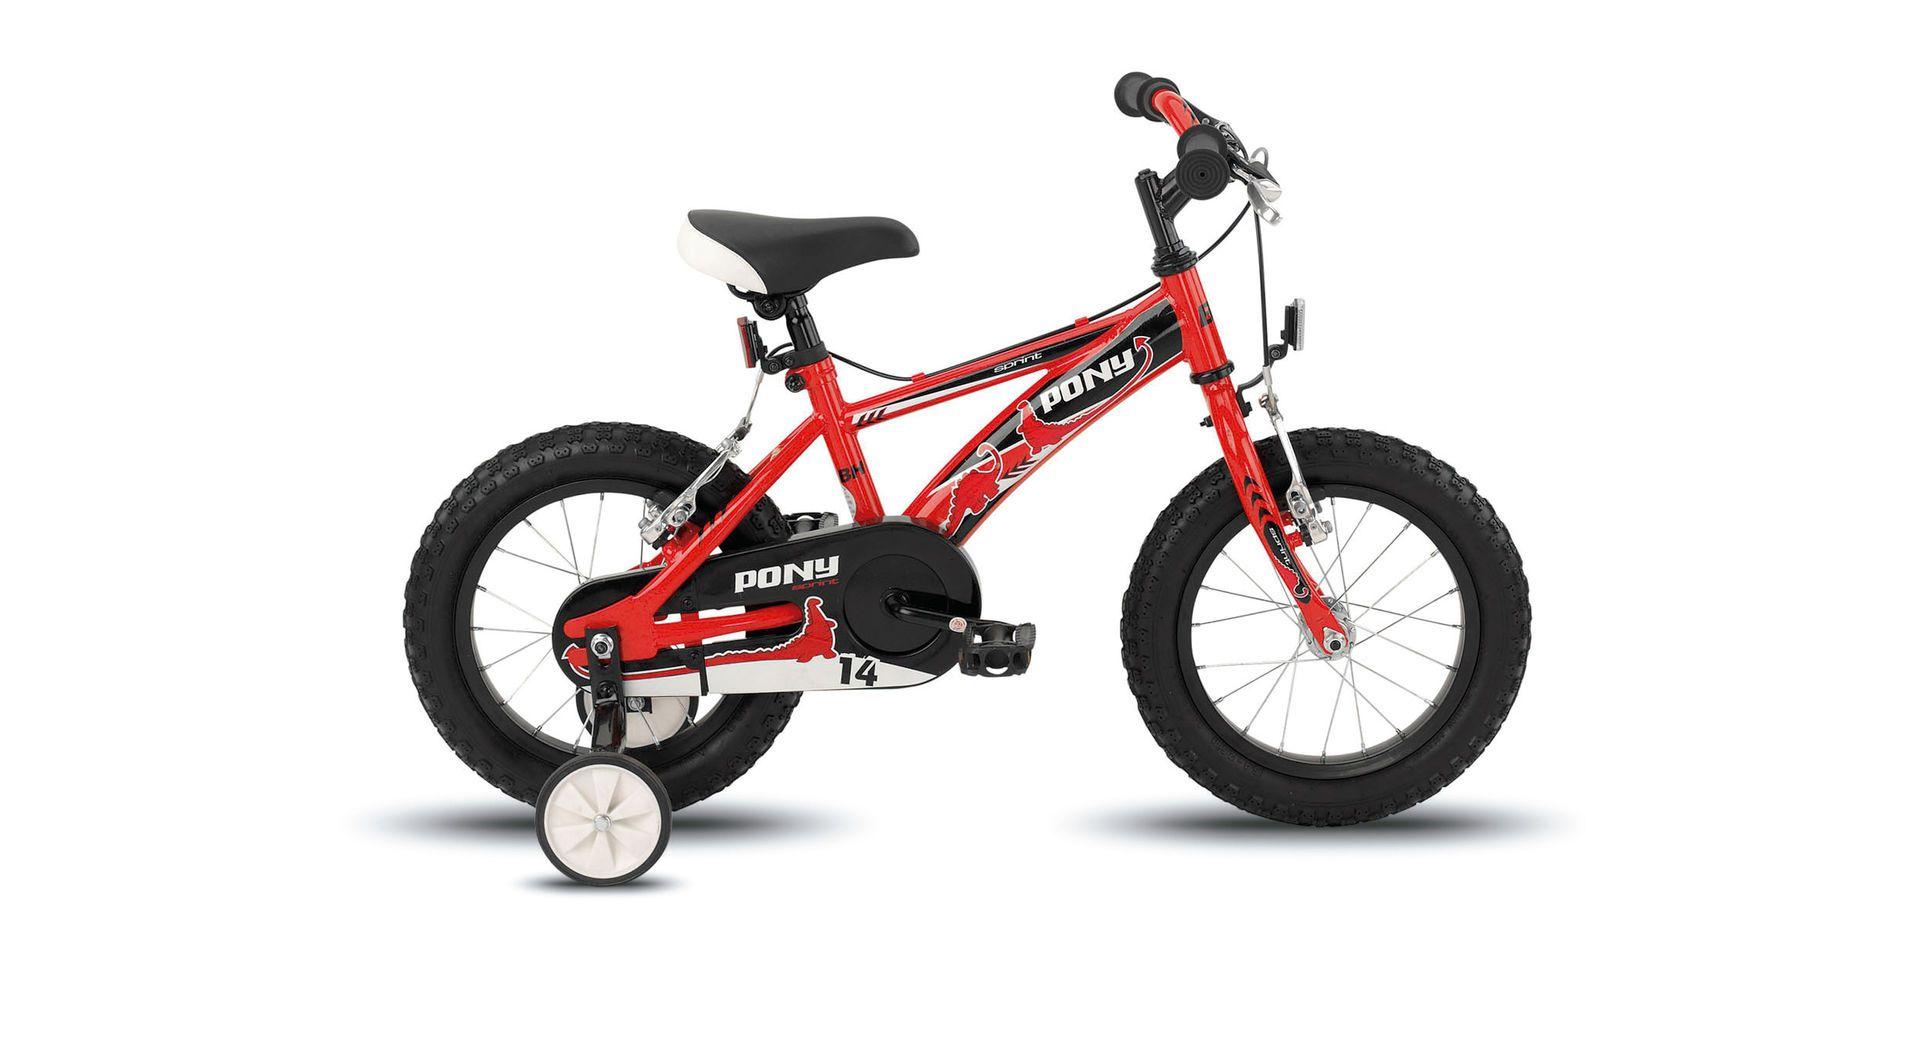 Bicicleta infantil en oferta